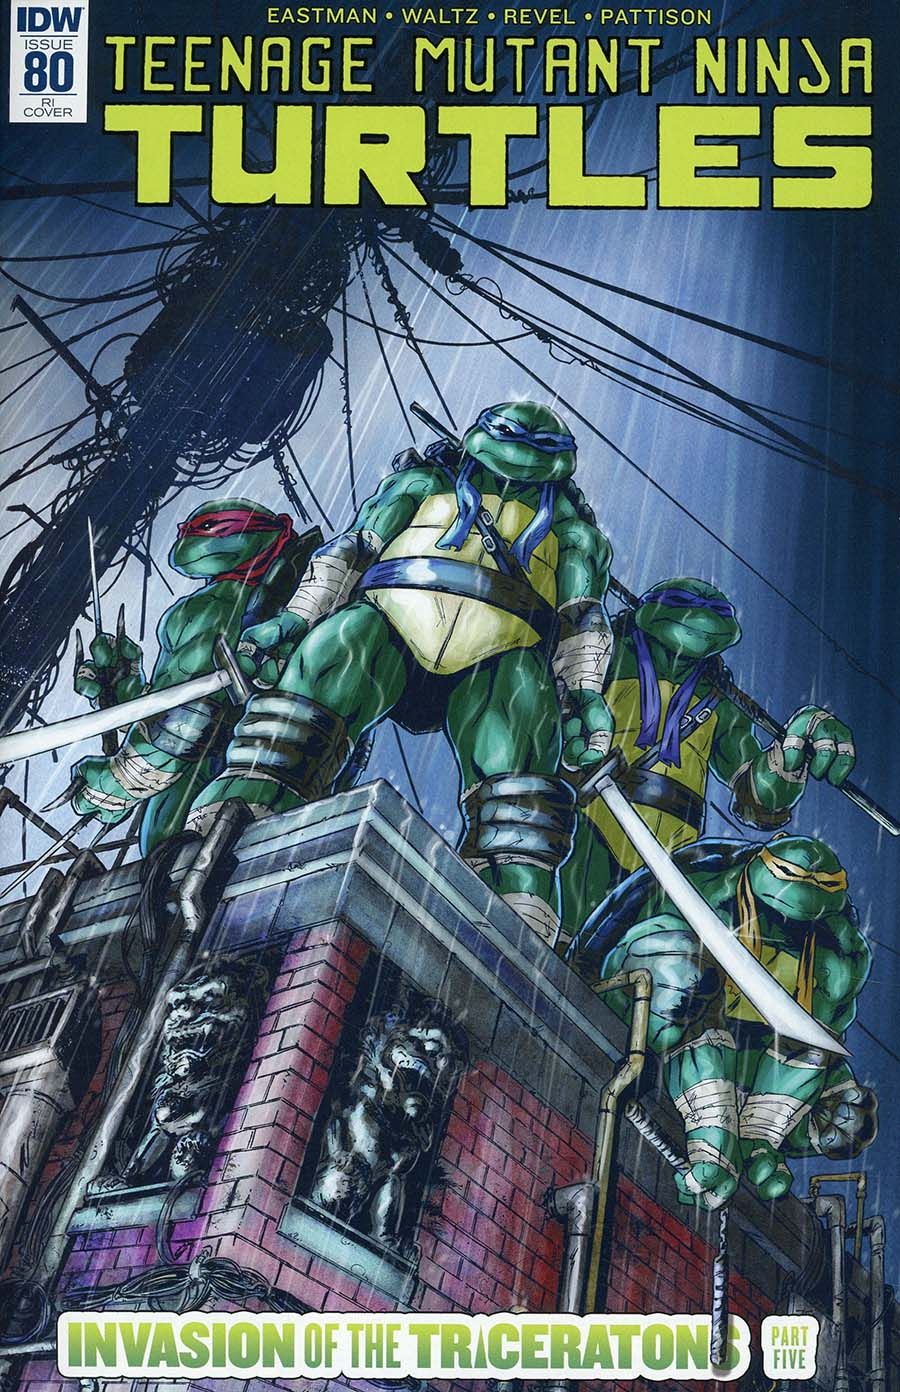 Teenage Mutant Ninja Turtles Vol 5 #80 Cover C Incentive Tadd Galusha Variant Cover